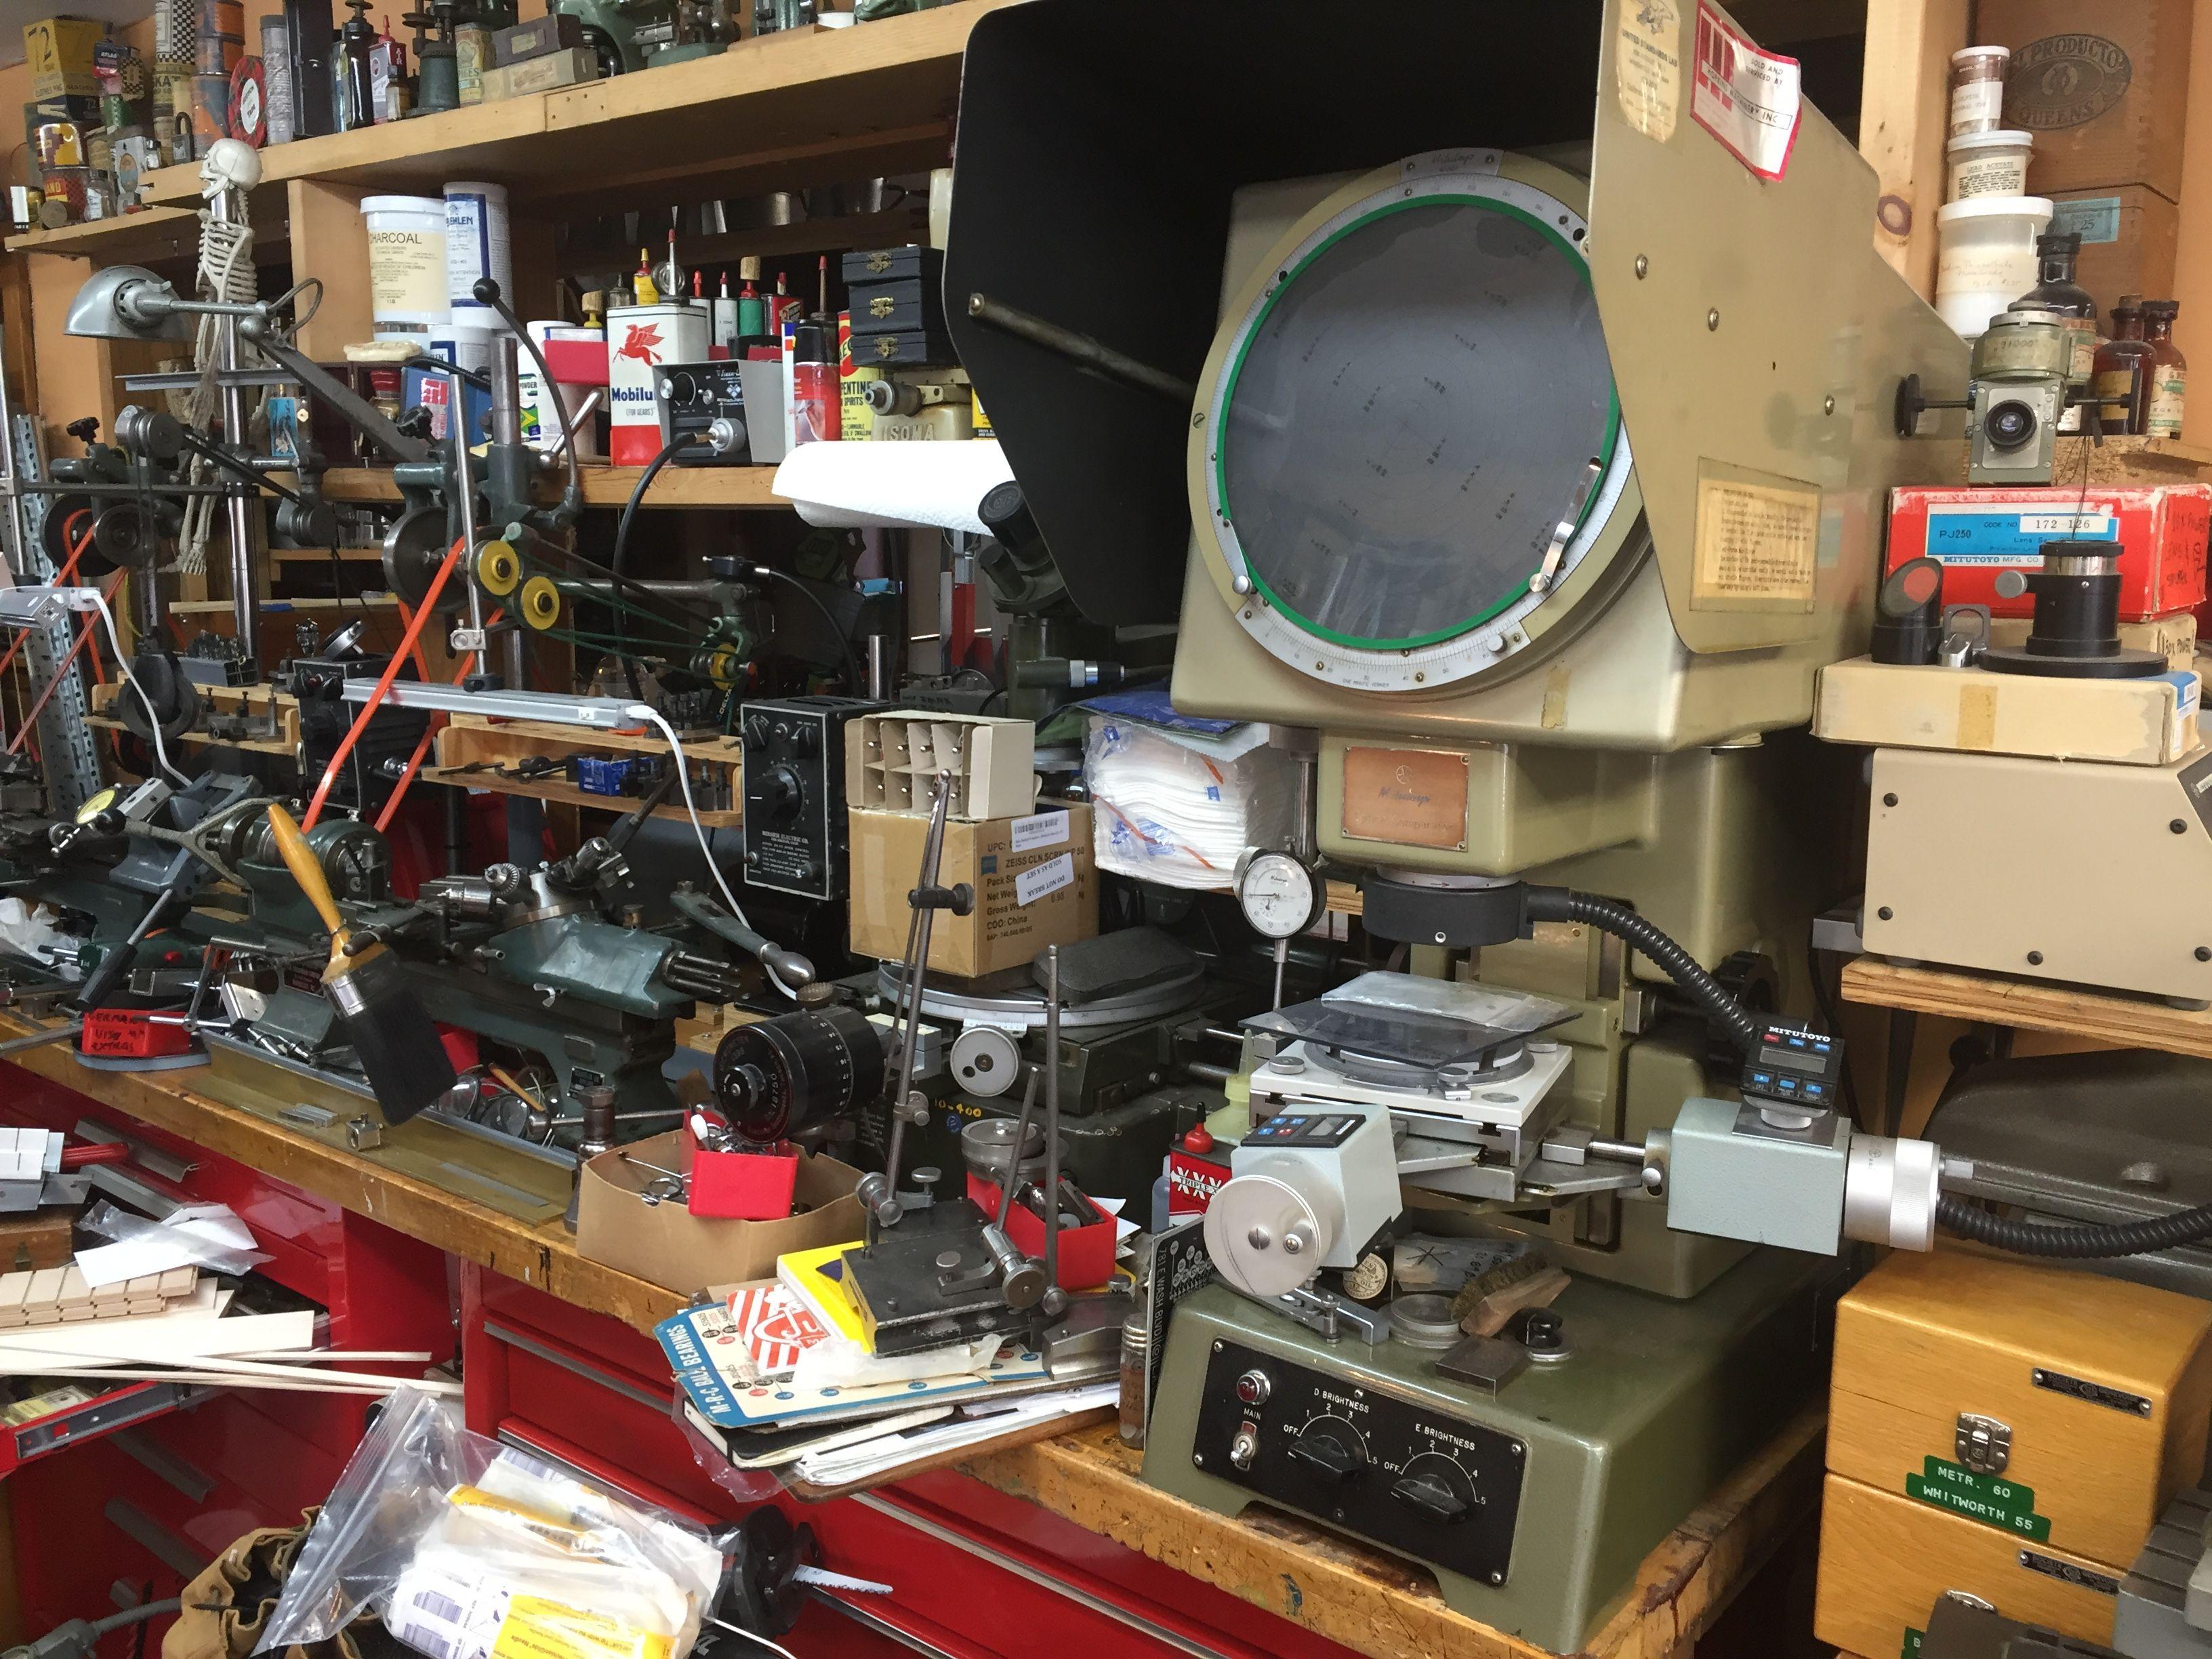 Epingle Par Snarfblat Dinglehopper Sur Benches To Build Jewelers And Watchmakers Kitchen Appliances Appliances Et Espresso Machine